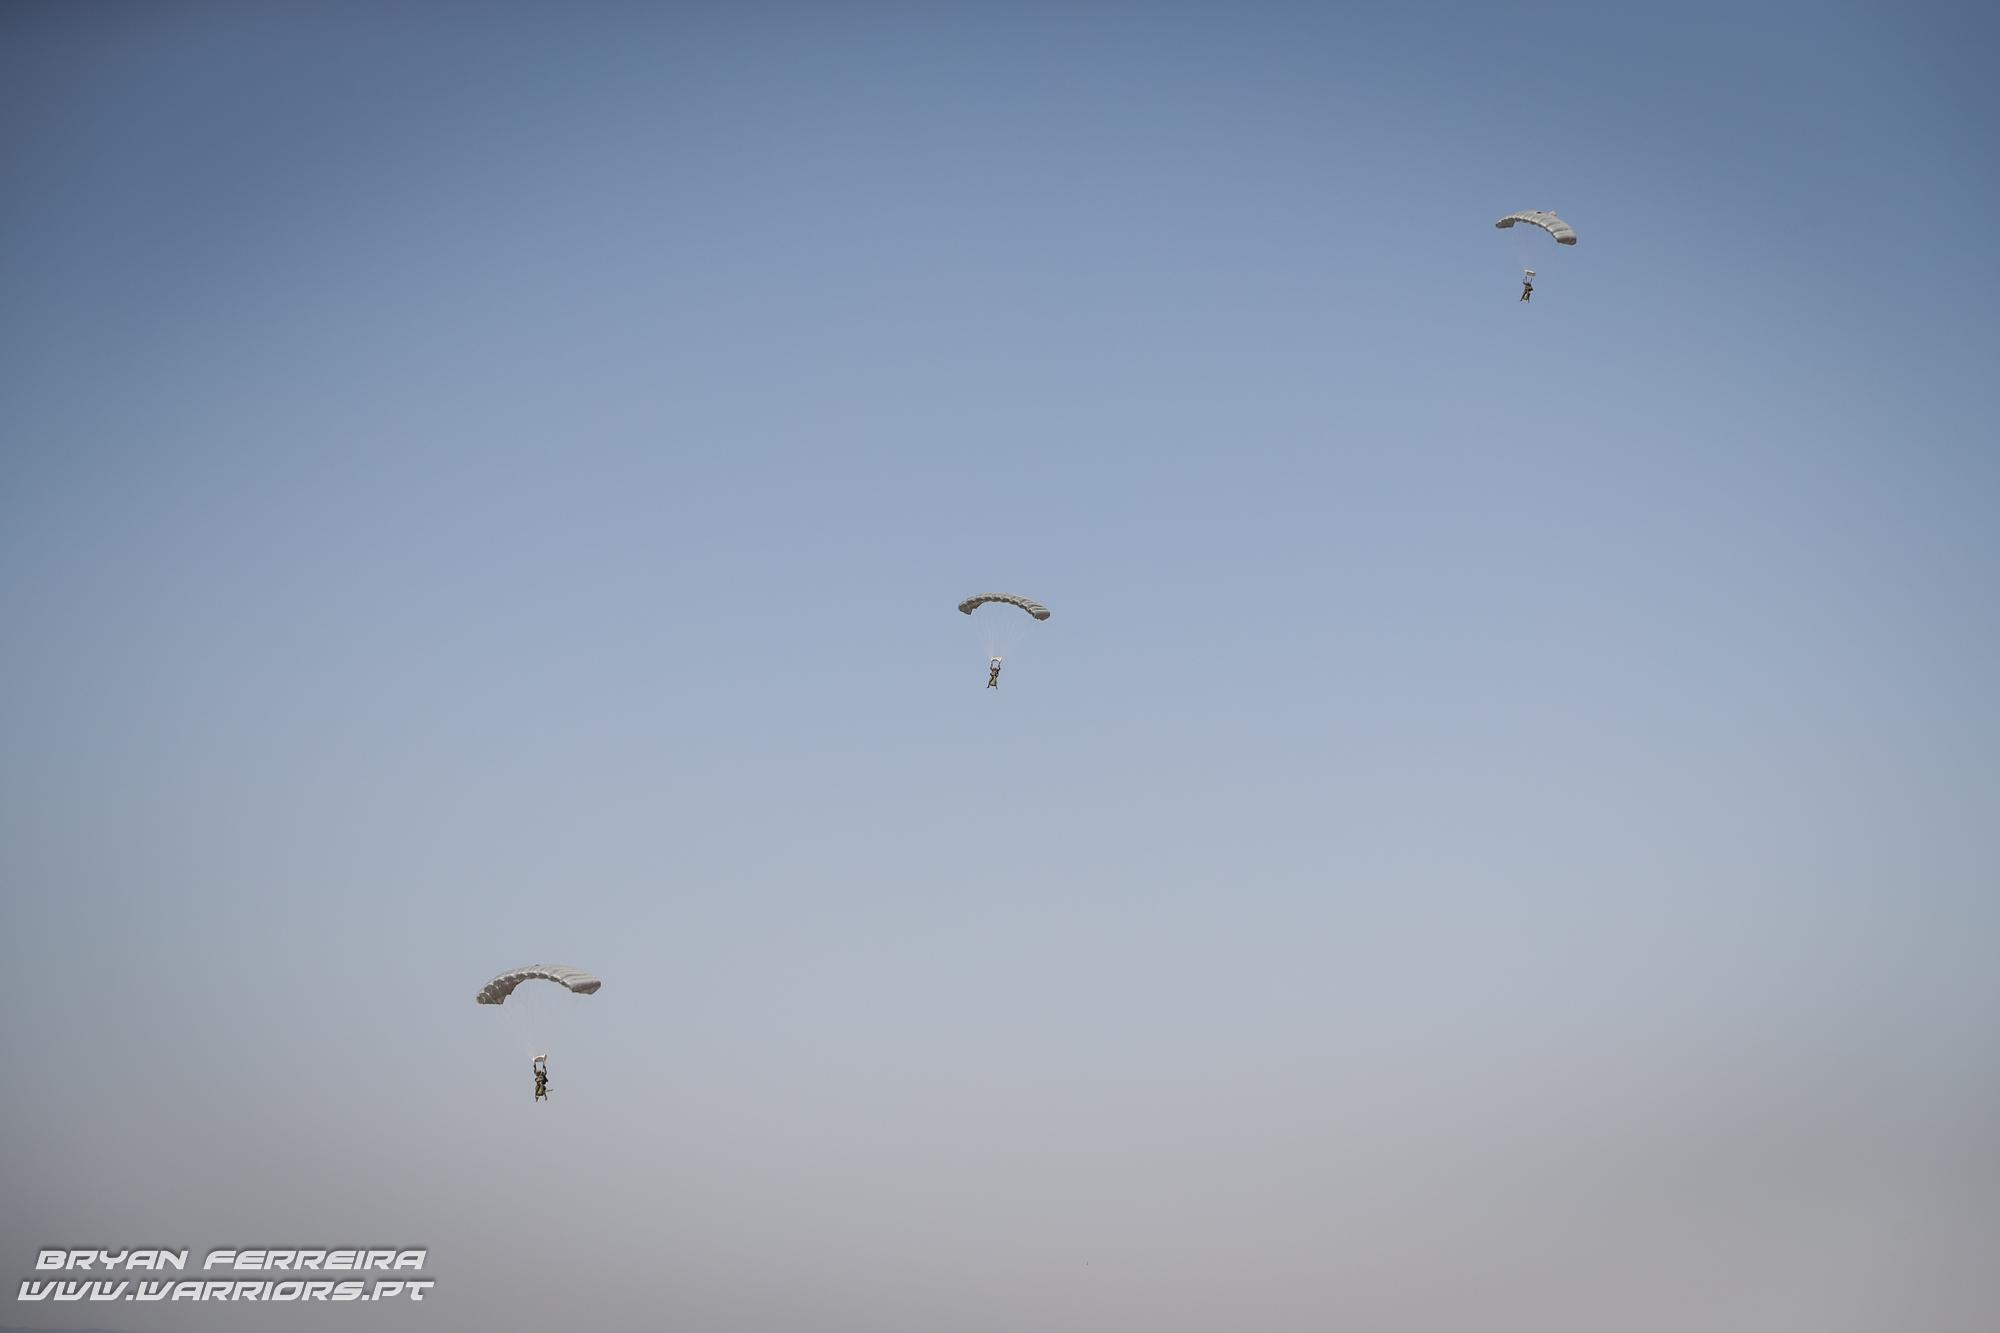 Orion 17 - Spain BRIPAC, 173rd Airborne Brigade and Portuguese Quick Reaction Brigade